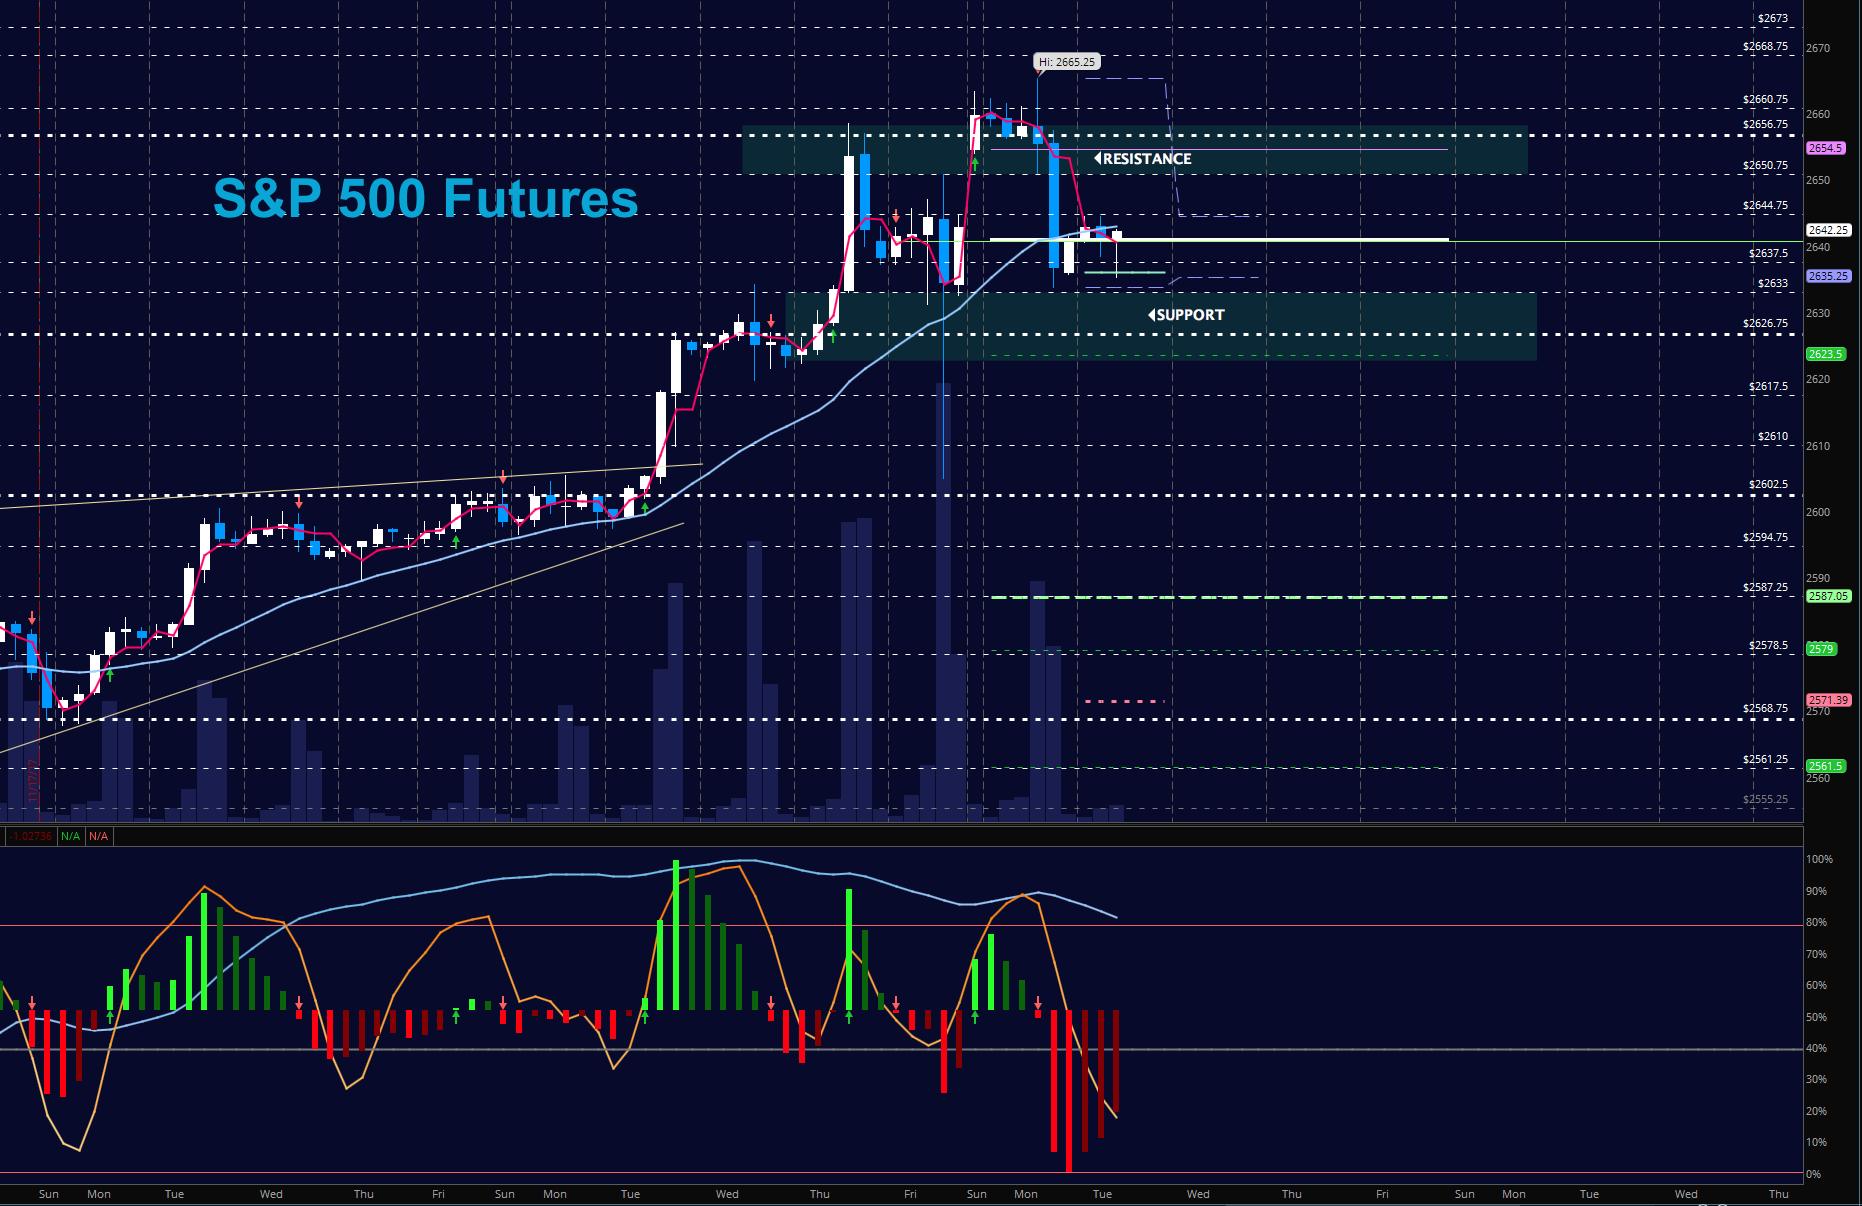 sp 500 futures december 5 stock market trading chart_news_update